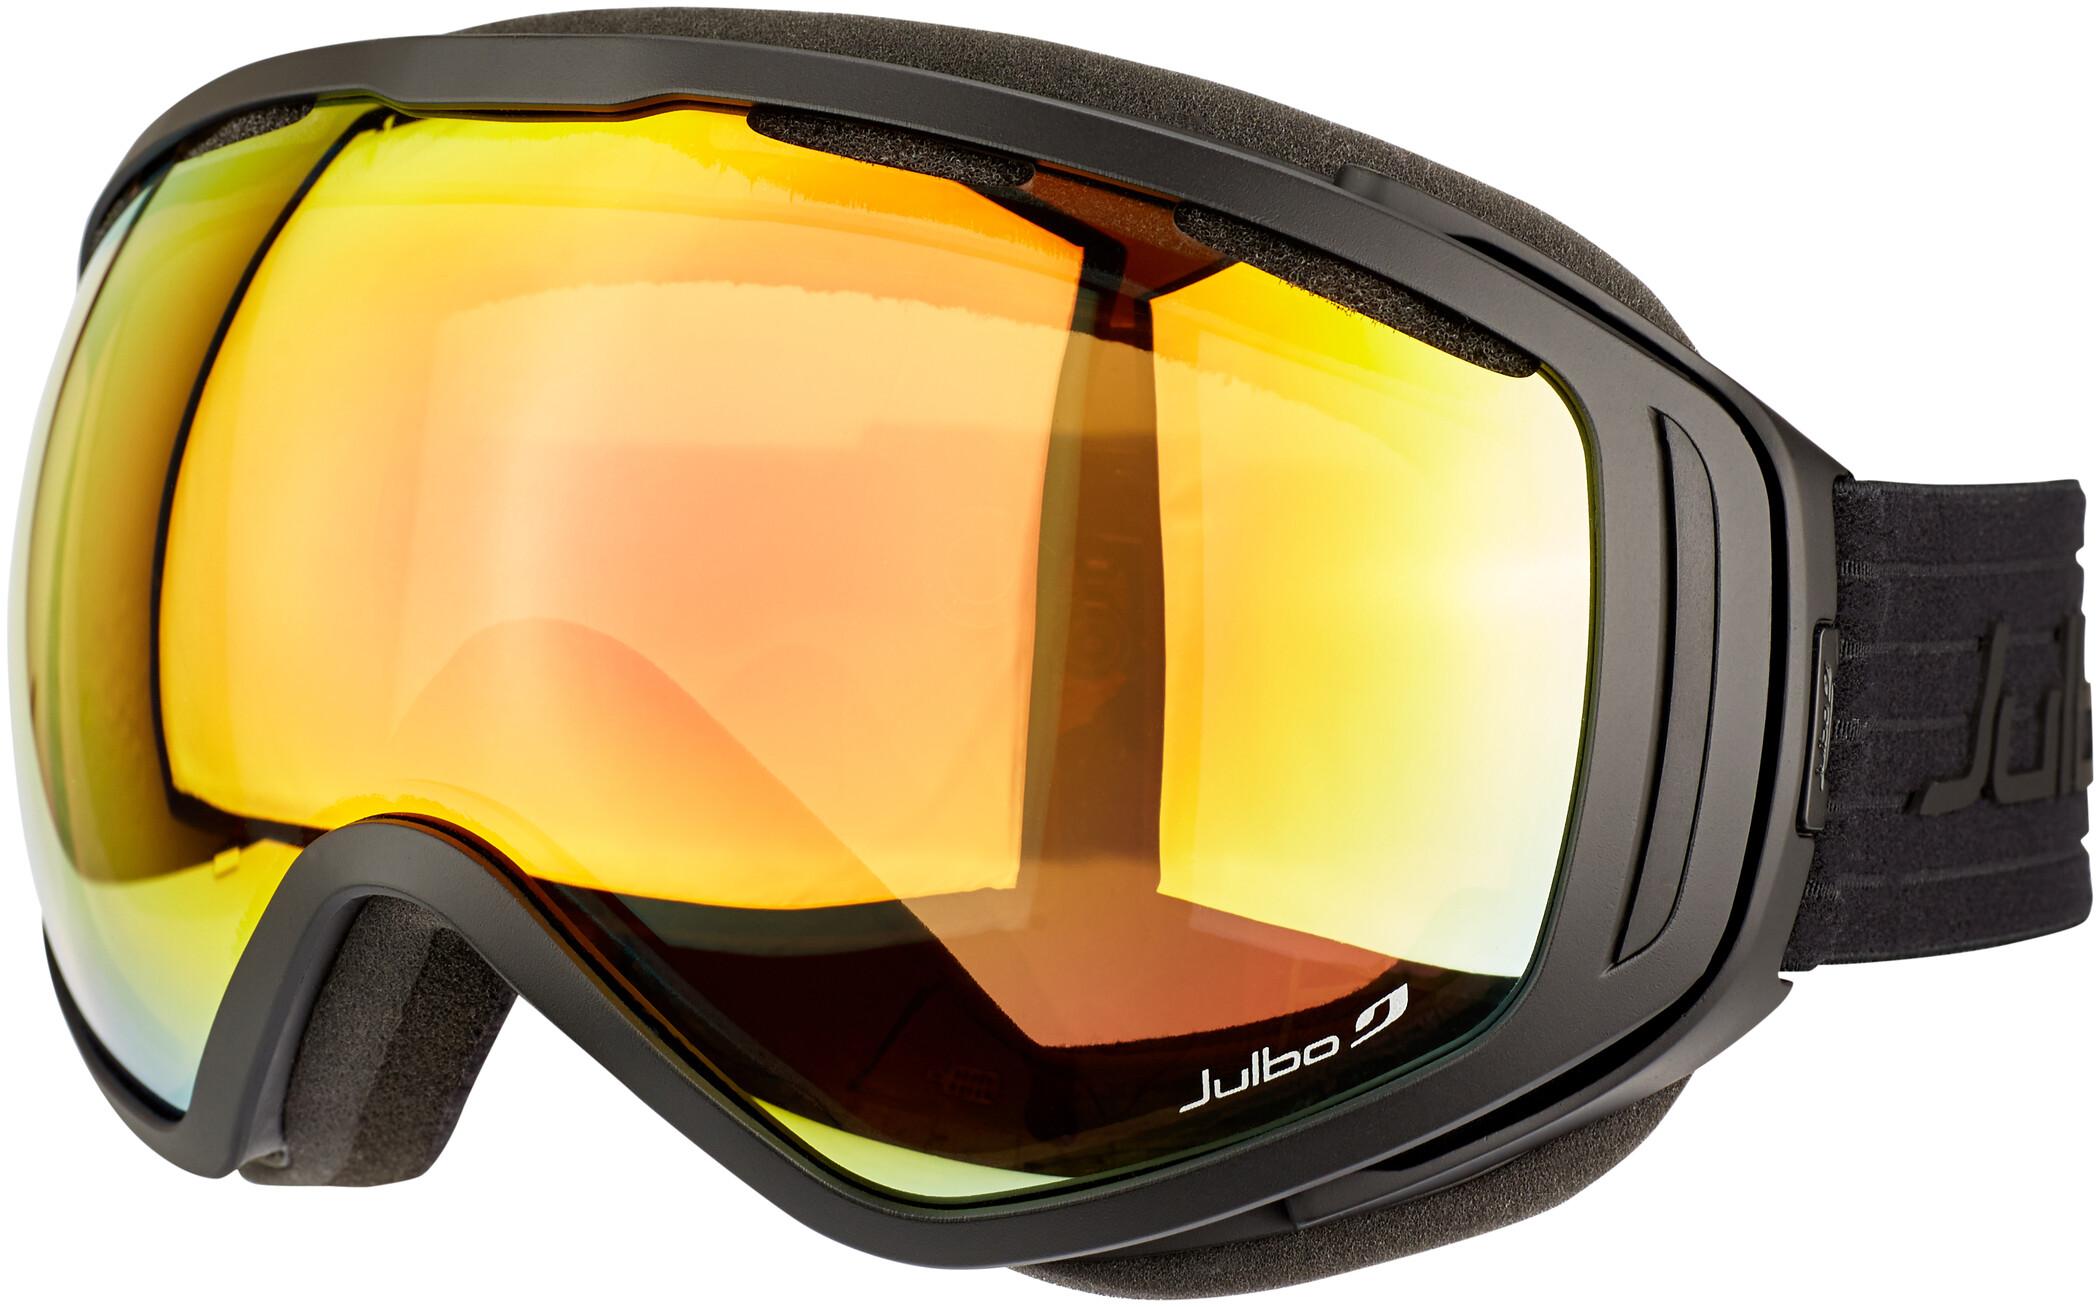 b1fa50d50b Julbo_Titan_OTG_Multilayer_Fire_Black_Snow_Tiger_Multilayer_Fire.jpg